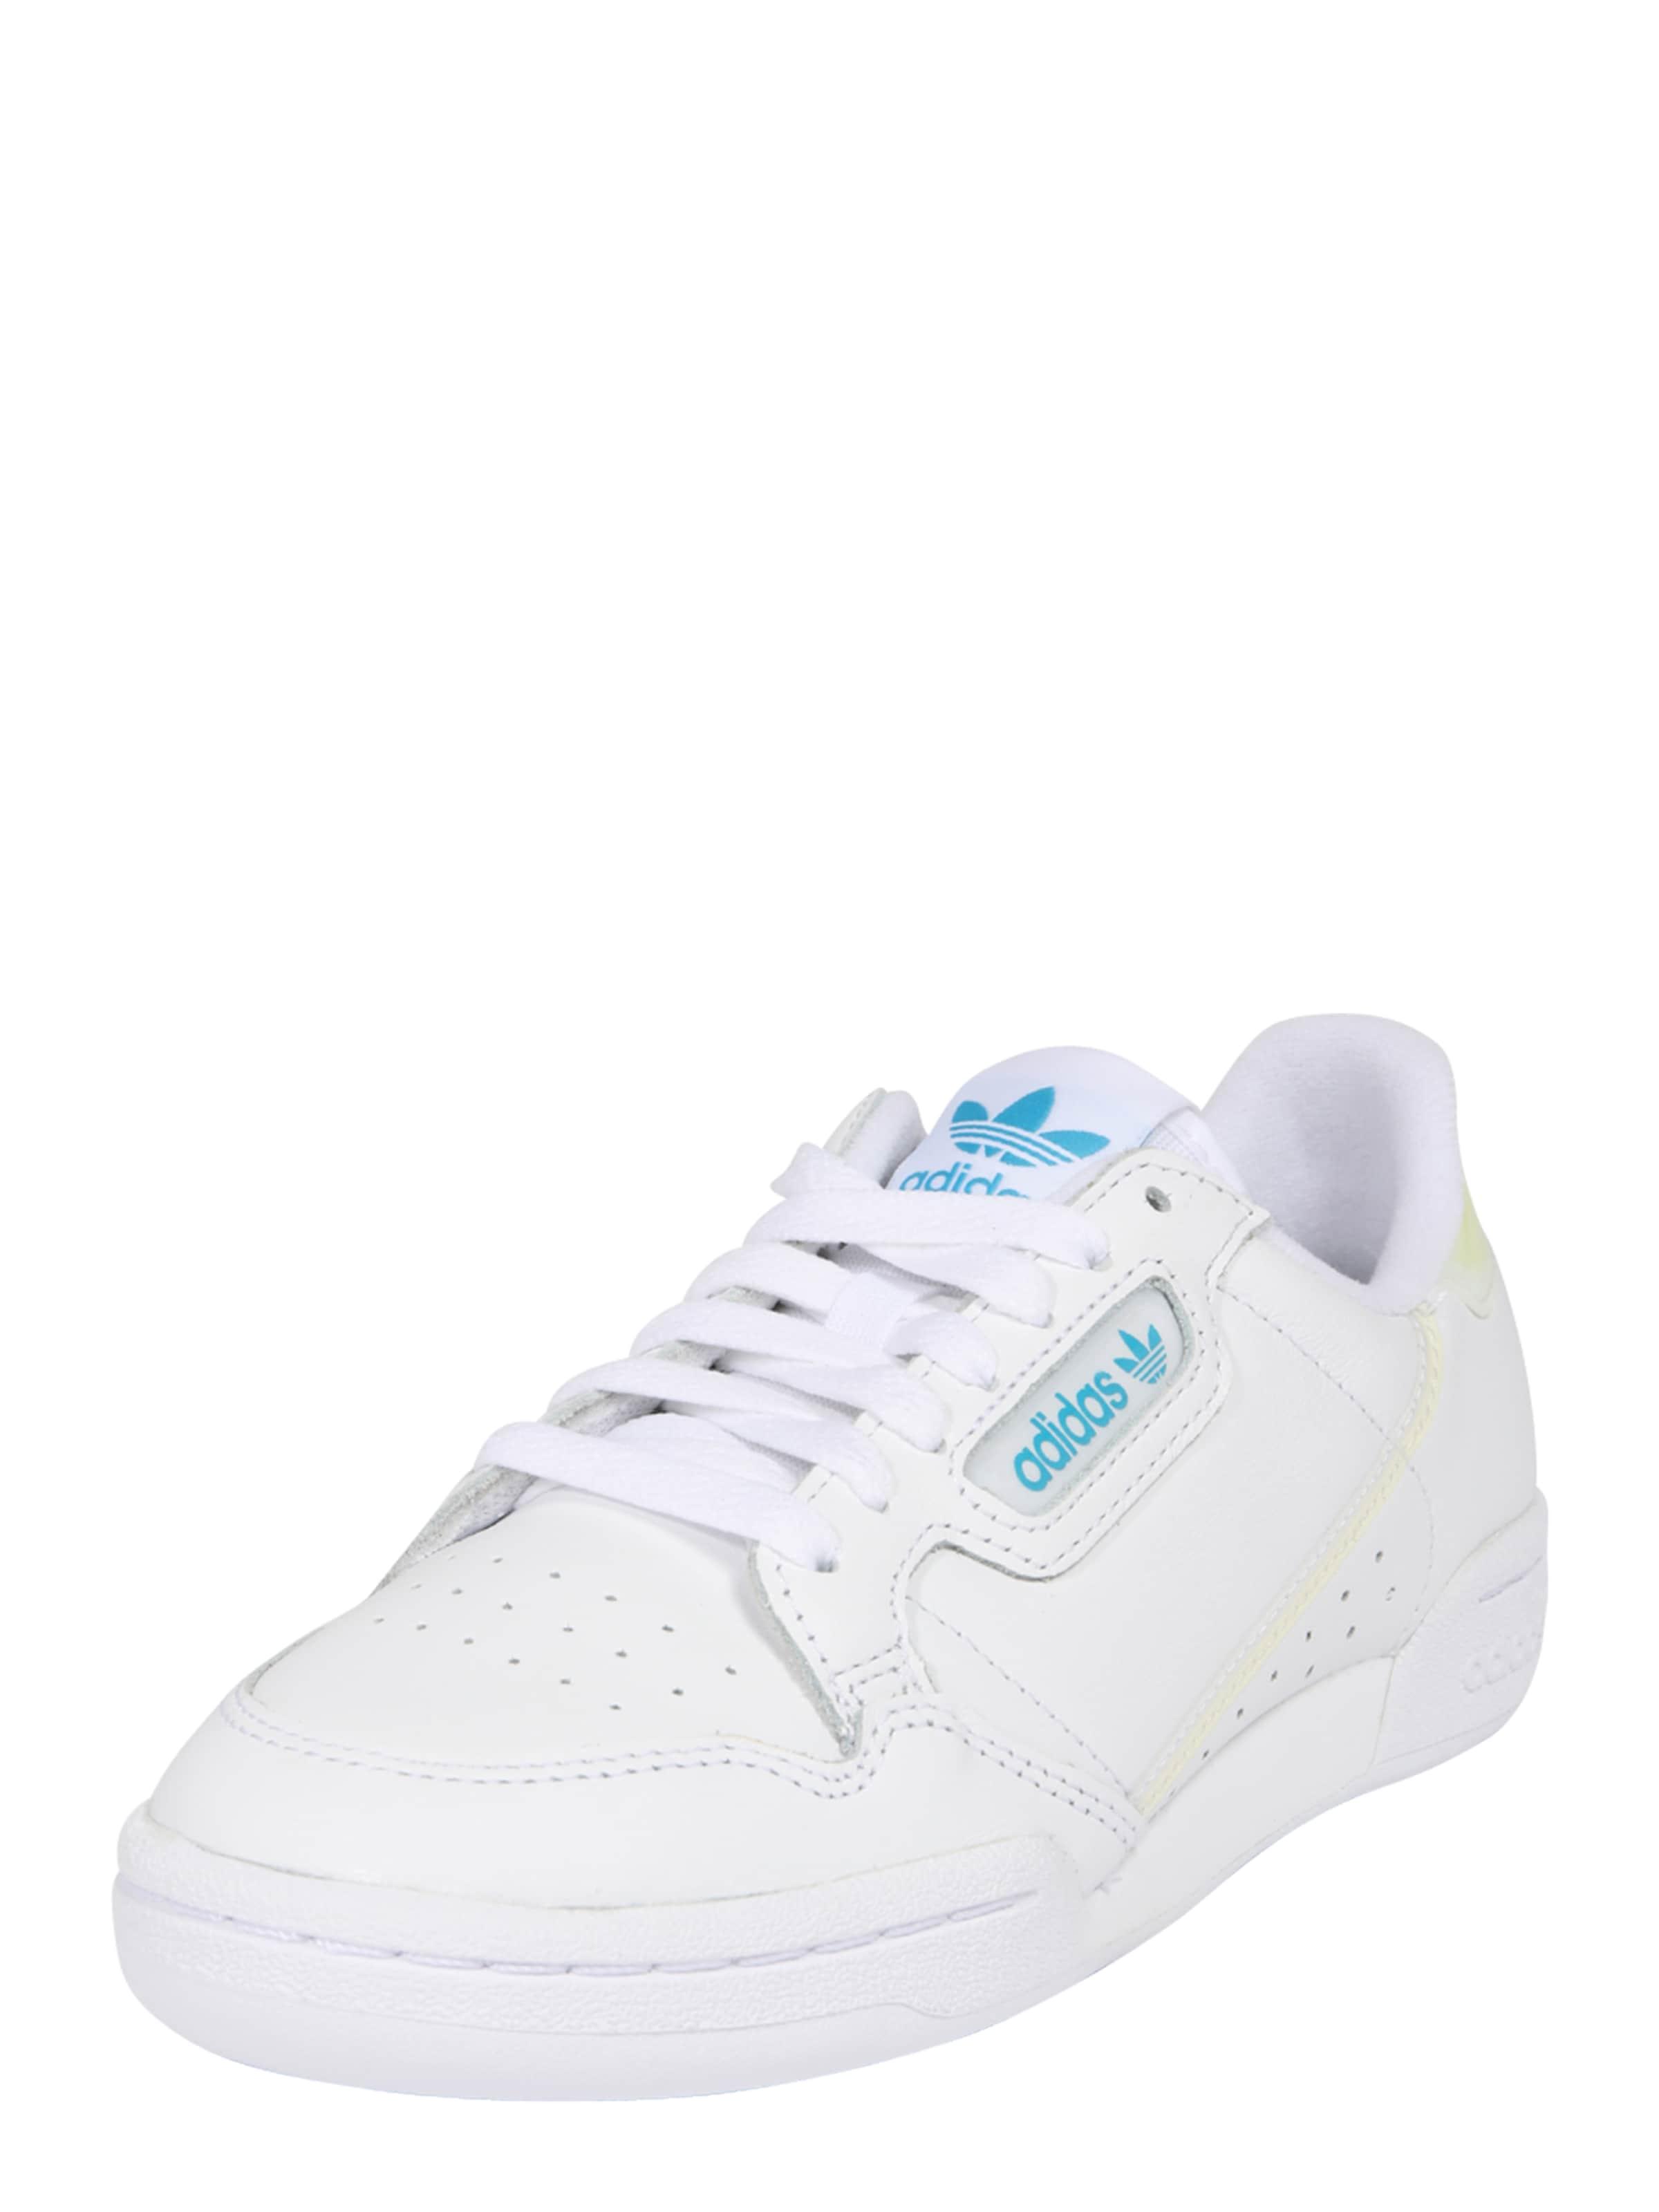 ADIDAS ORIGINALS Låg sneaker 'Continental 80' i ljusblå / gul / vit